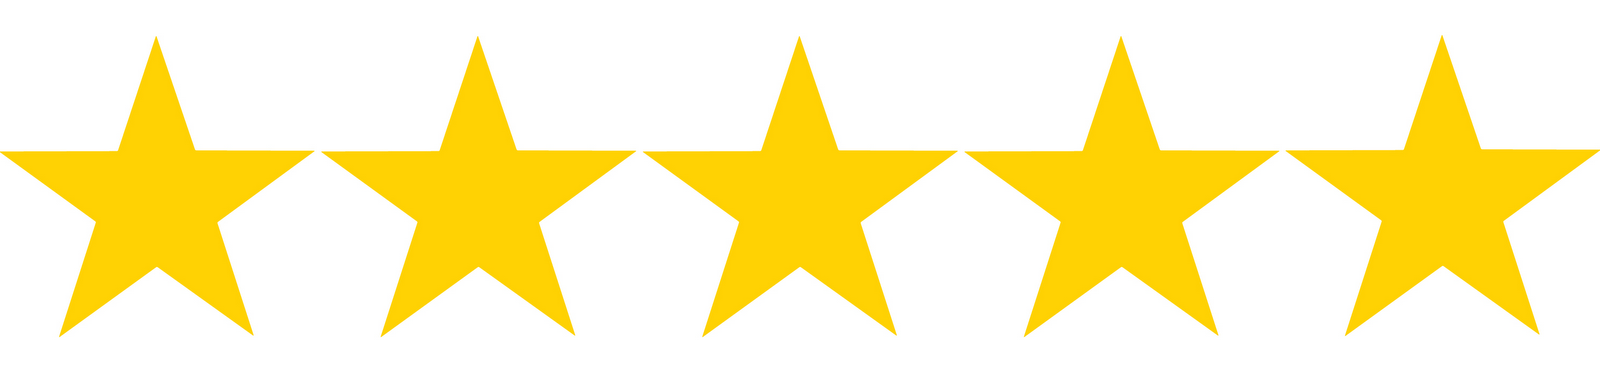 Arch clipart star #3